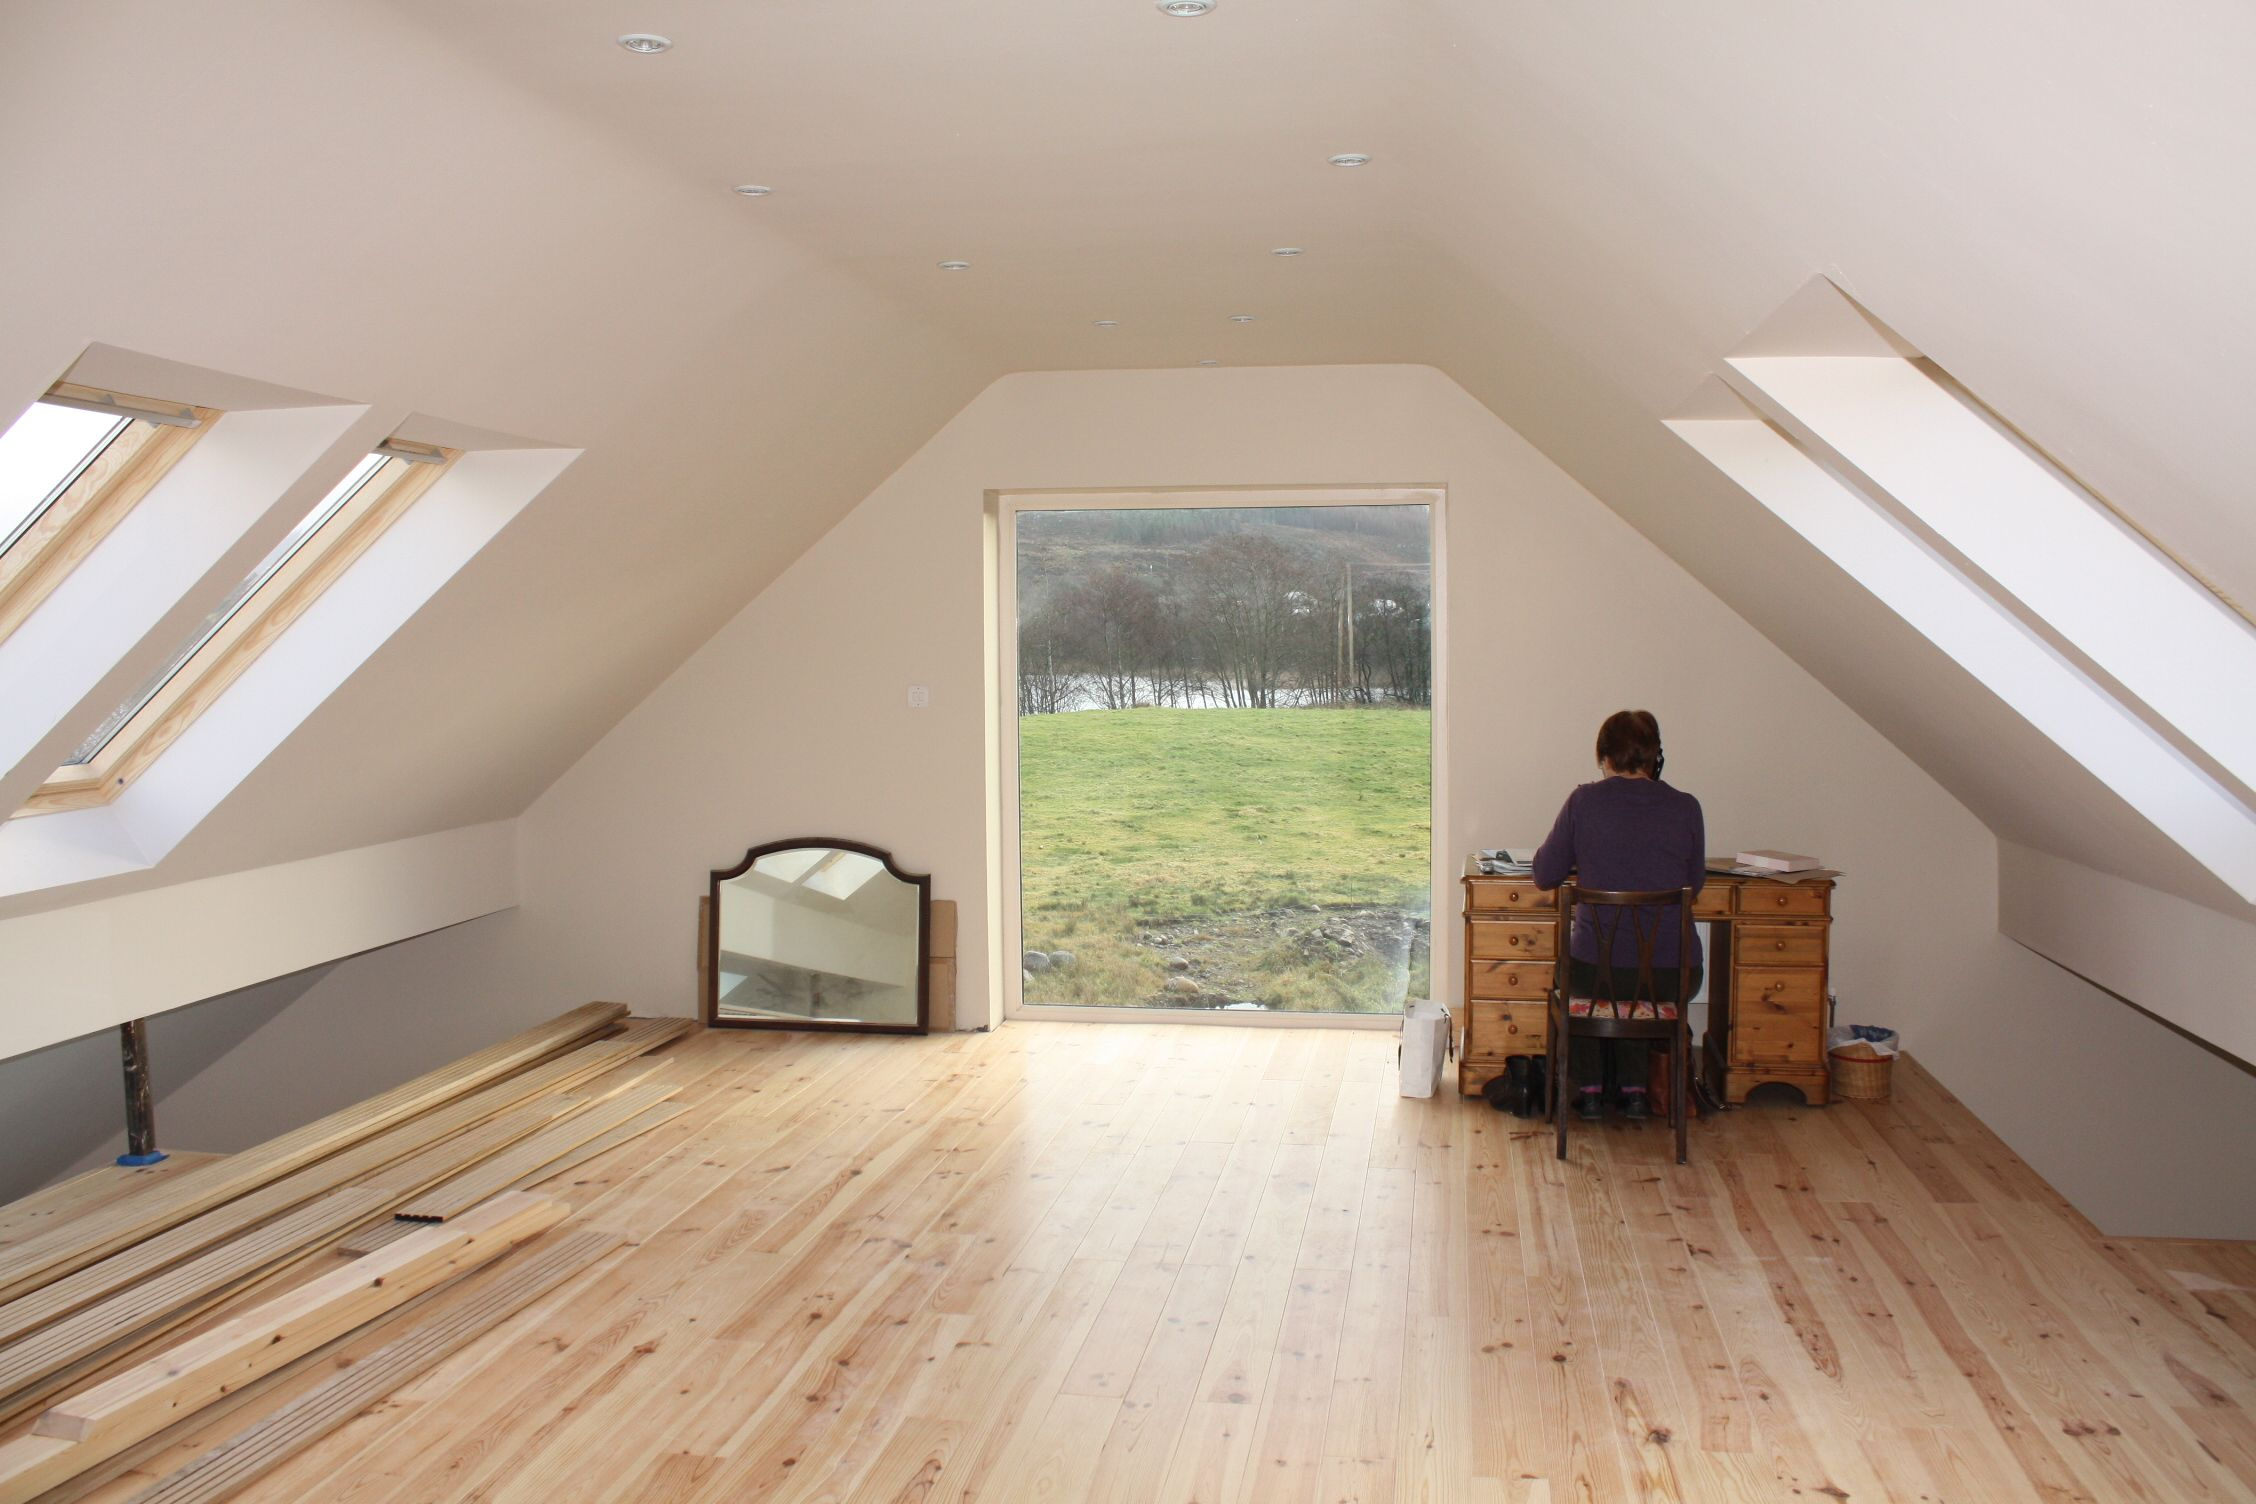 Related Image Cottage Renovation Little House Loft Conversion